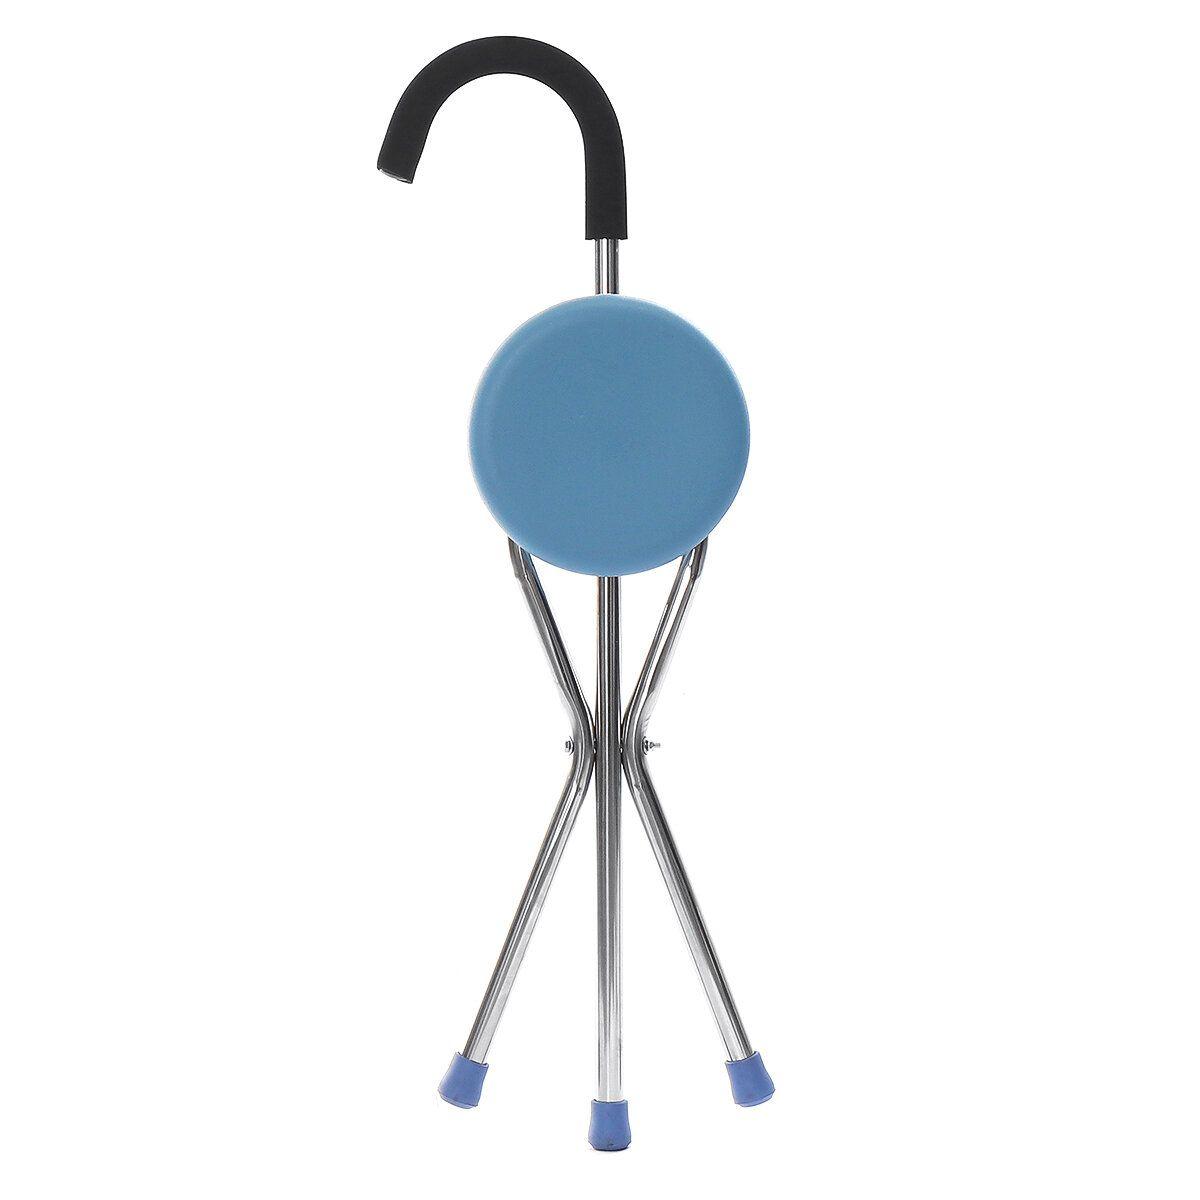 CDG US$25.99 Travel Cane Walking Stick Seat Camp Hiking Folding Stool Stick Portable Folding Chair